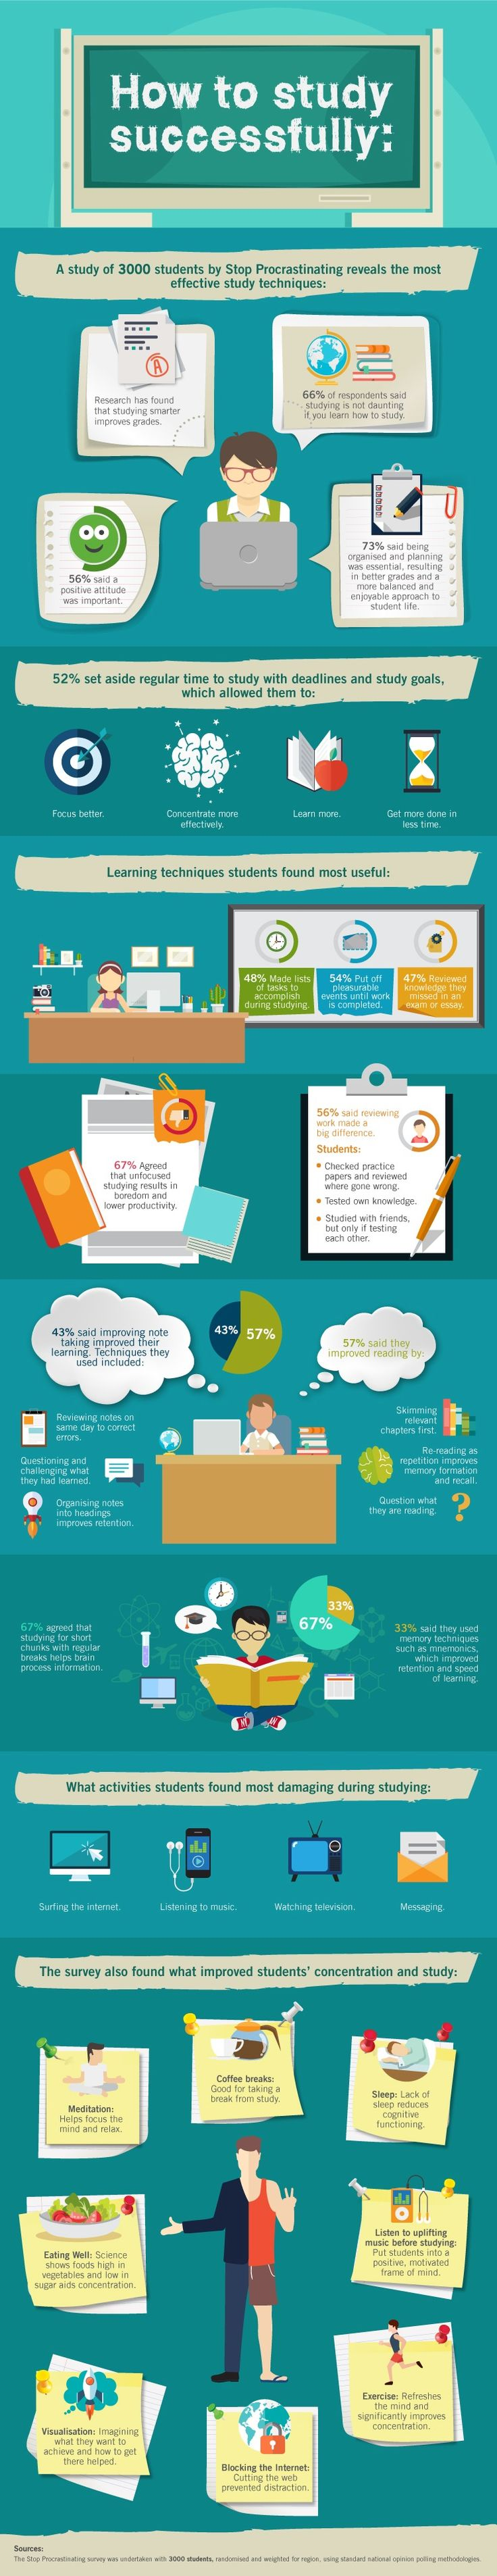 Effective study tips wikihow